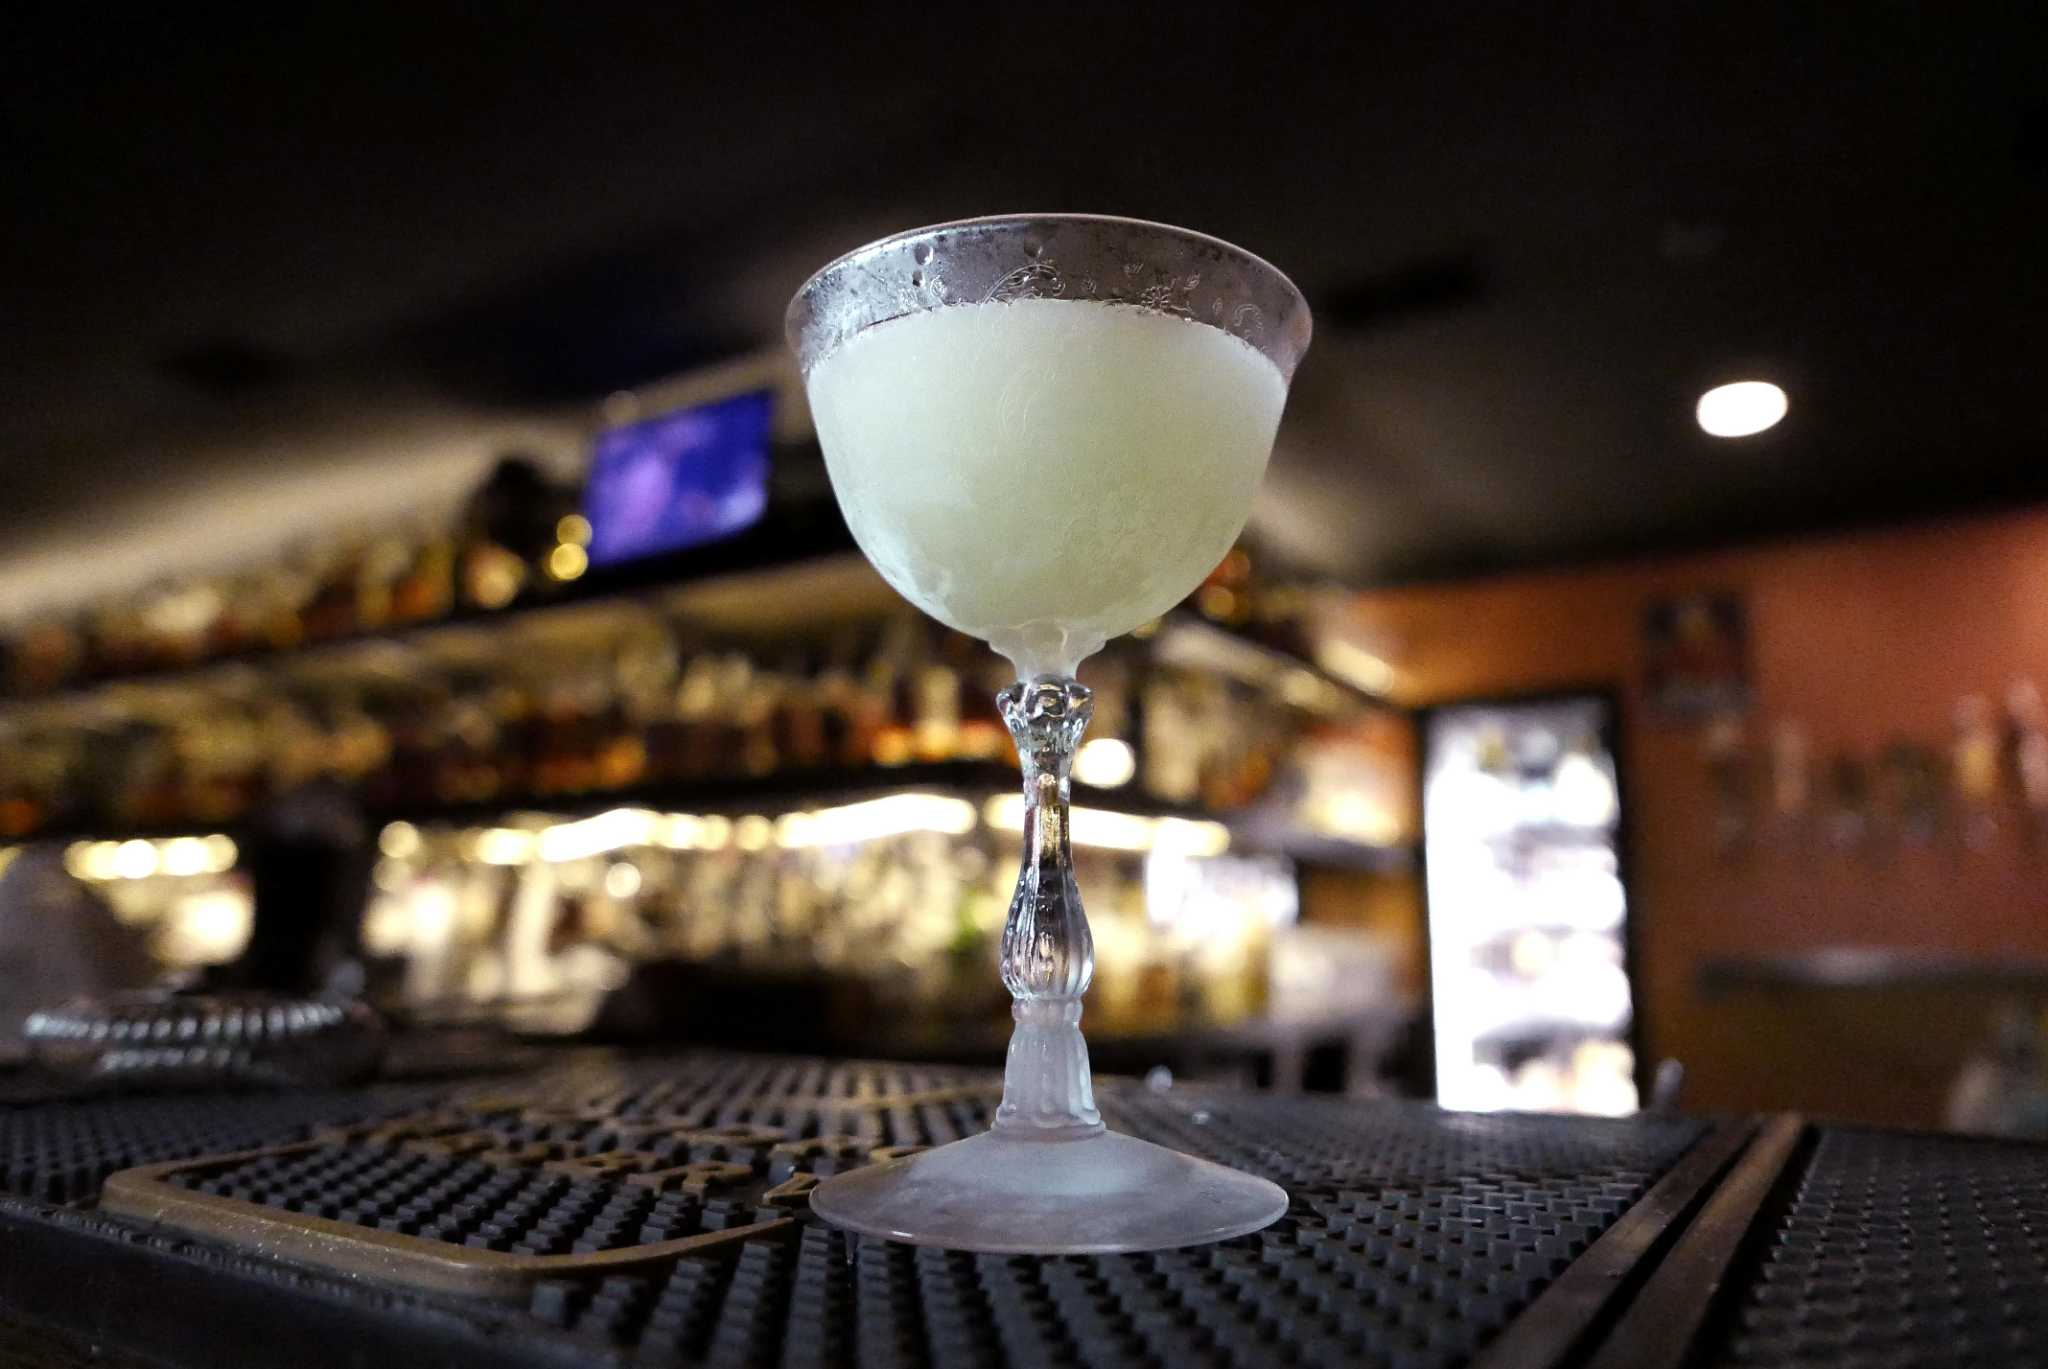 Merveilleux A White Mule Cocktail At Bar 1919.